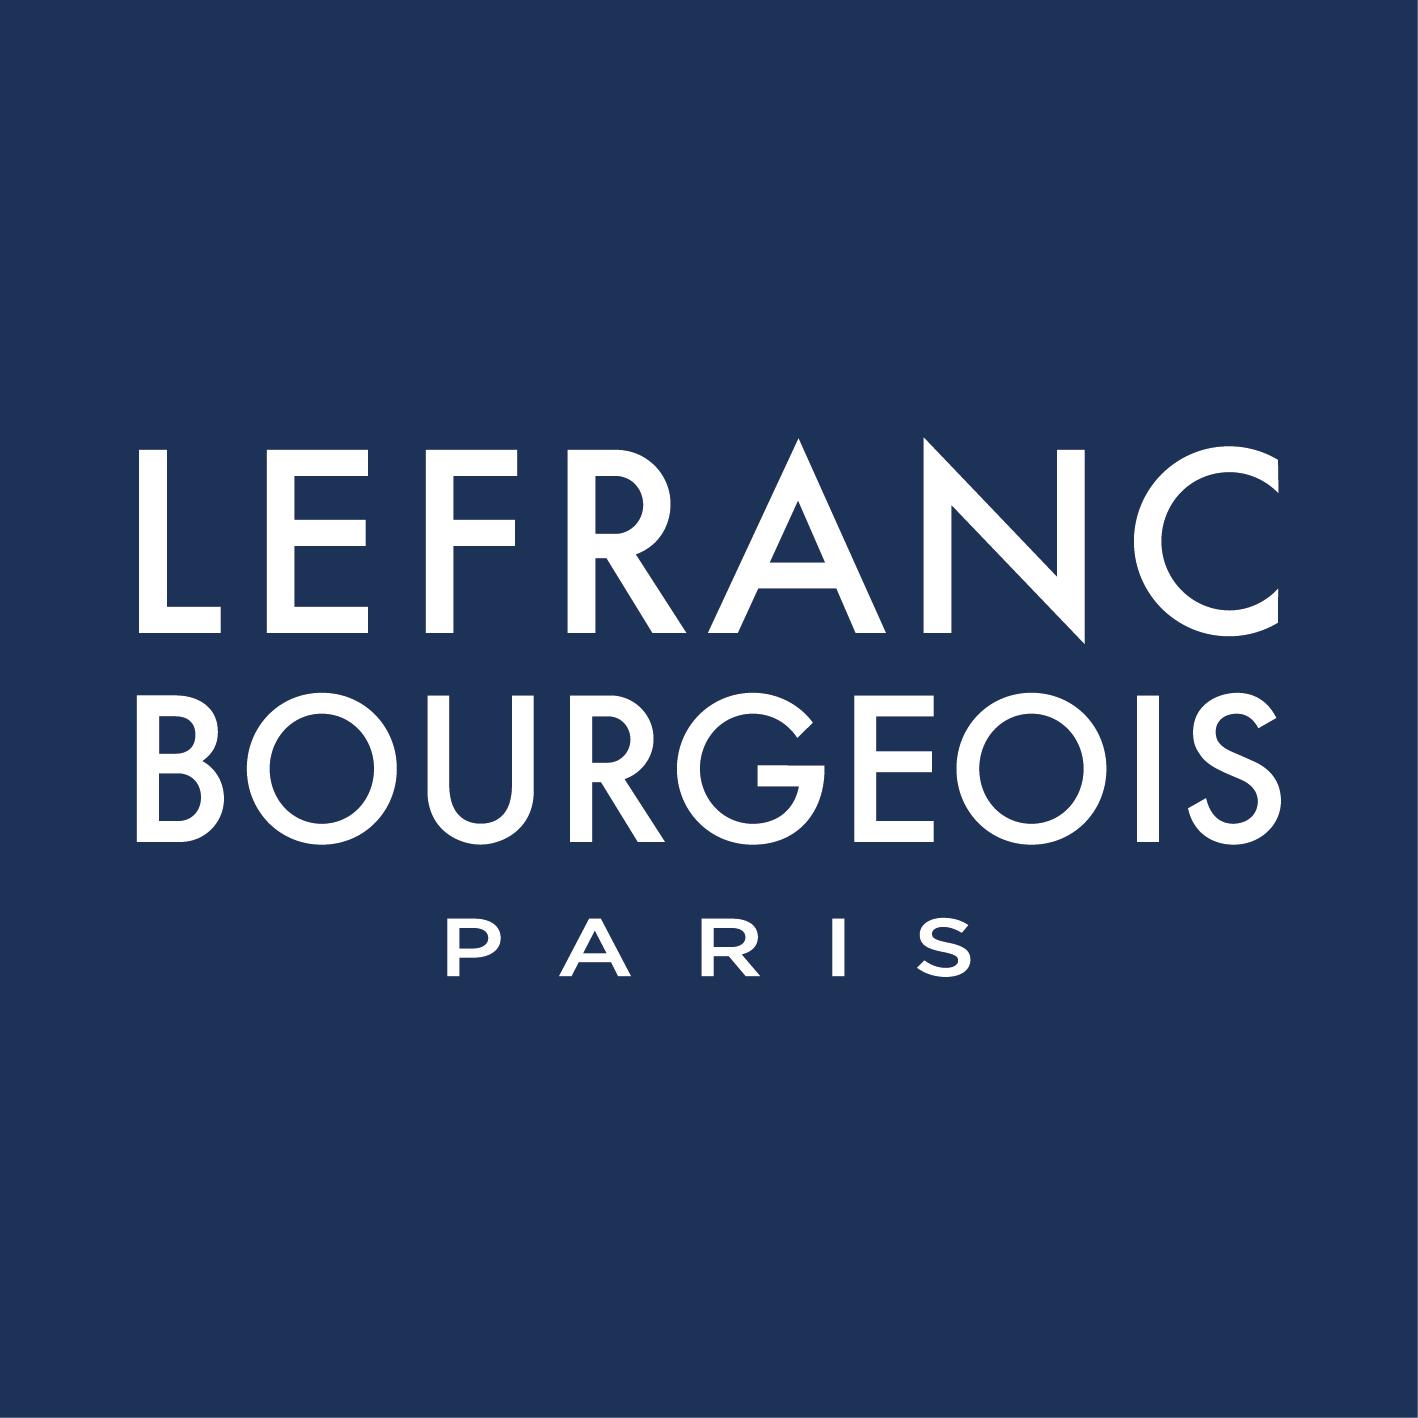 ليفرانك بورجويس | LEFRANC BOURGEOIS